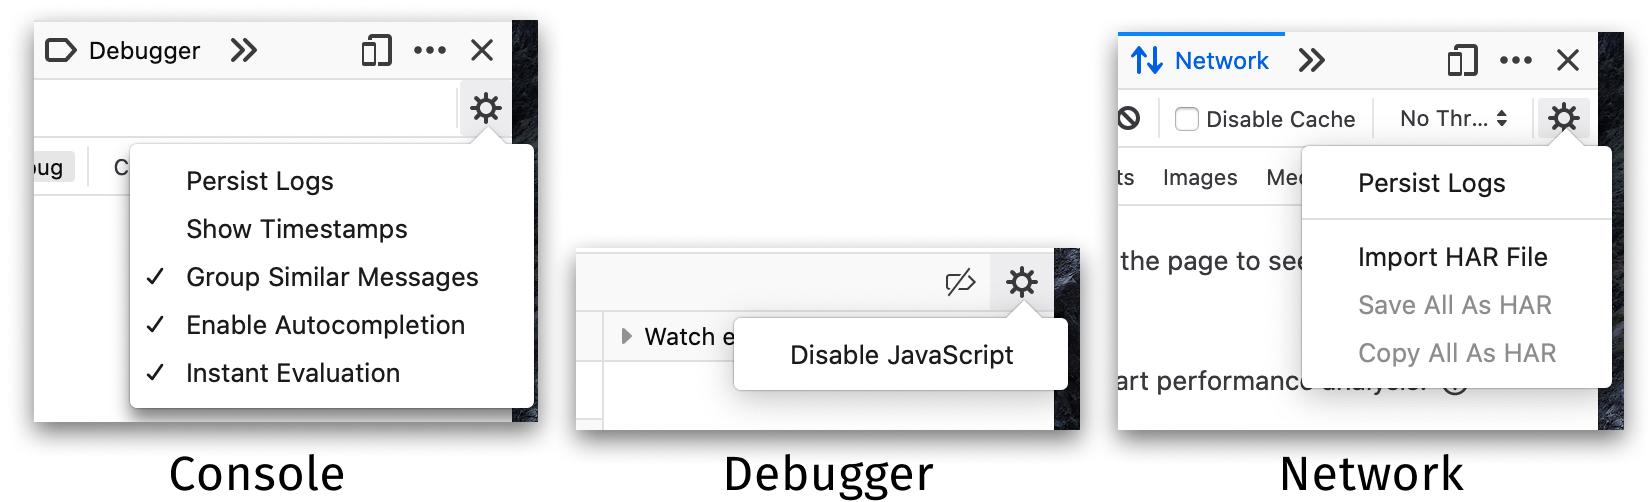 Overflow settings menus in both Network and Debugger toolbar.